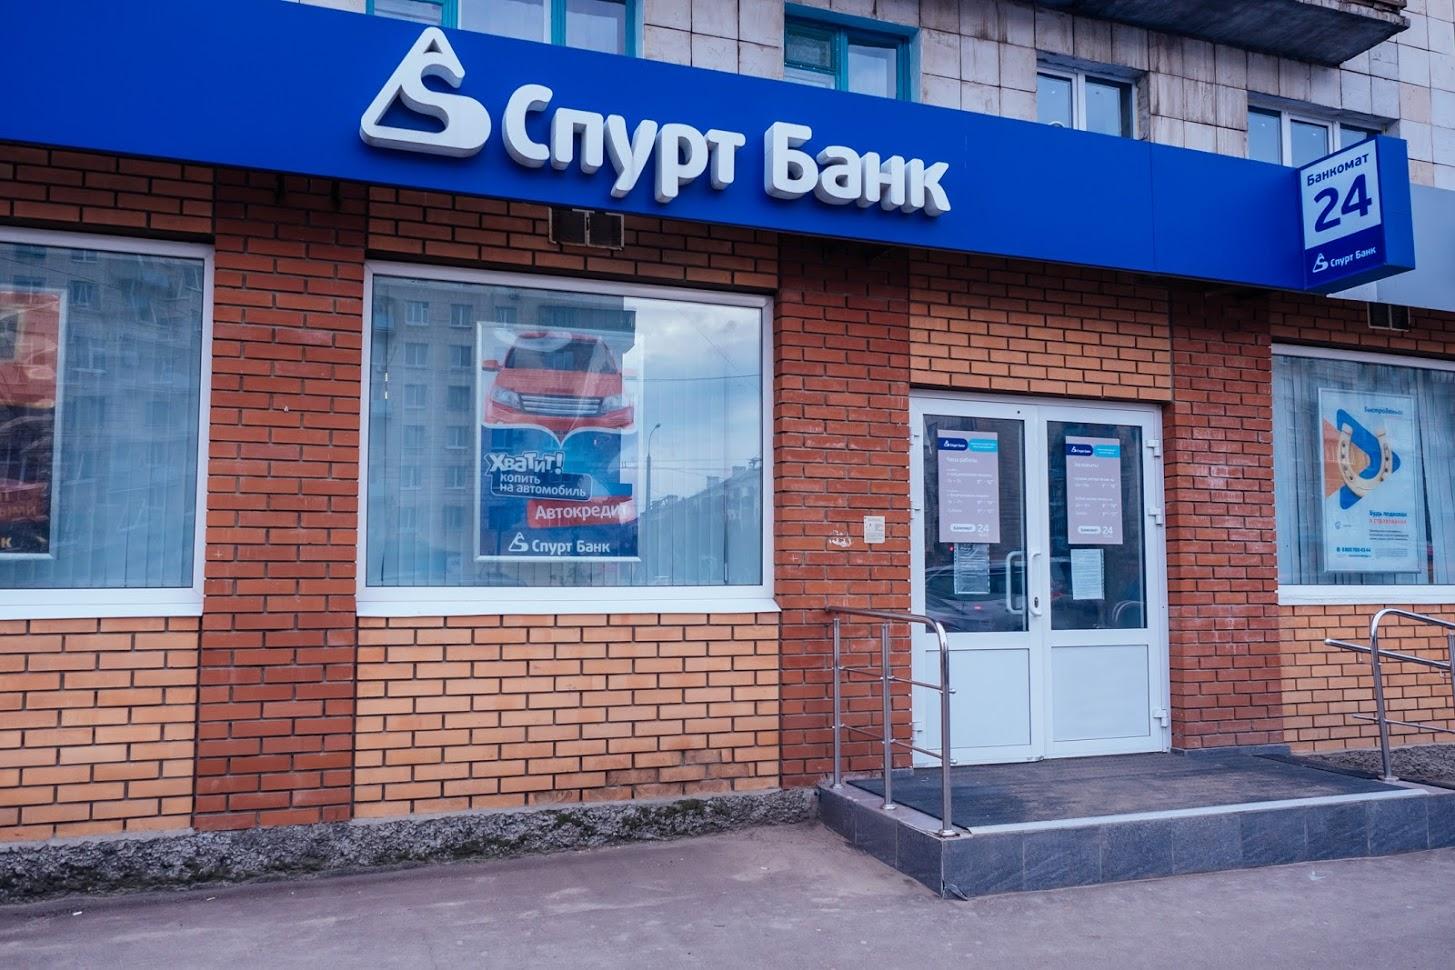 Наликвидацию Спурт Банка истратят практически 100 млн руб.